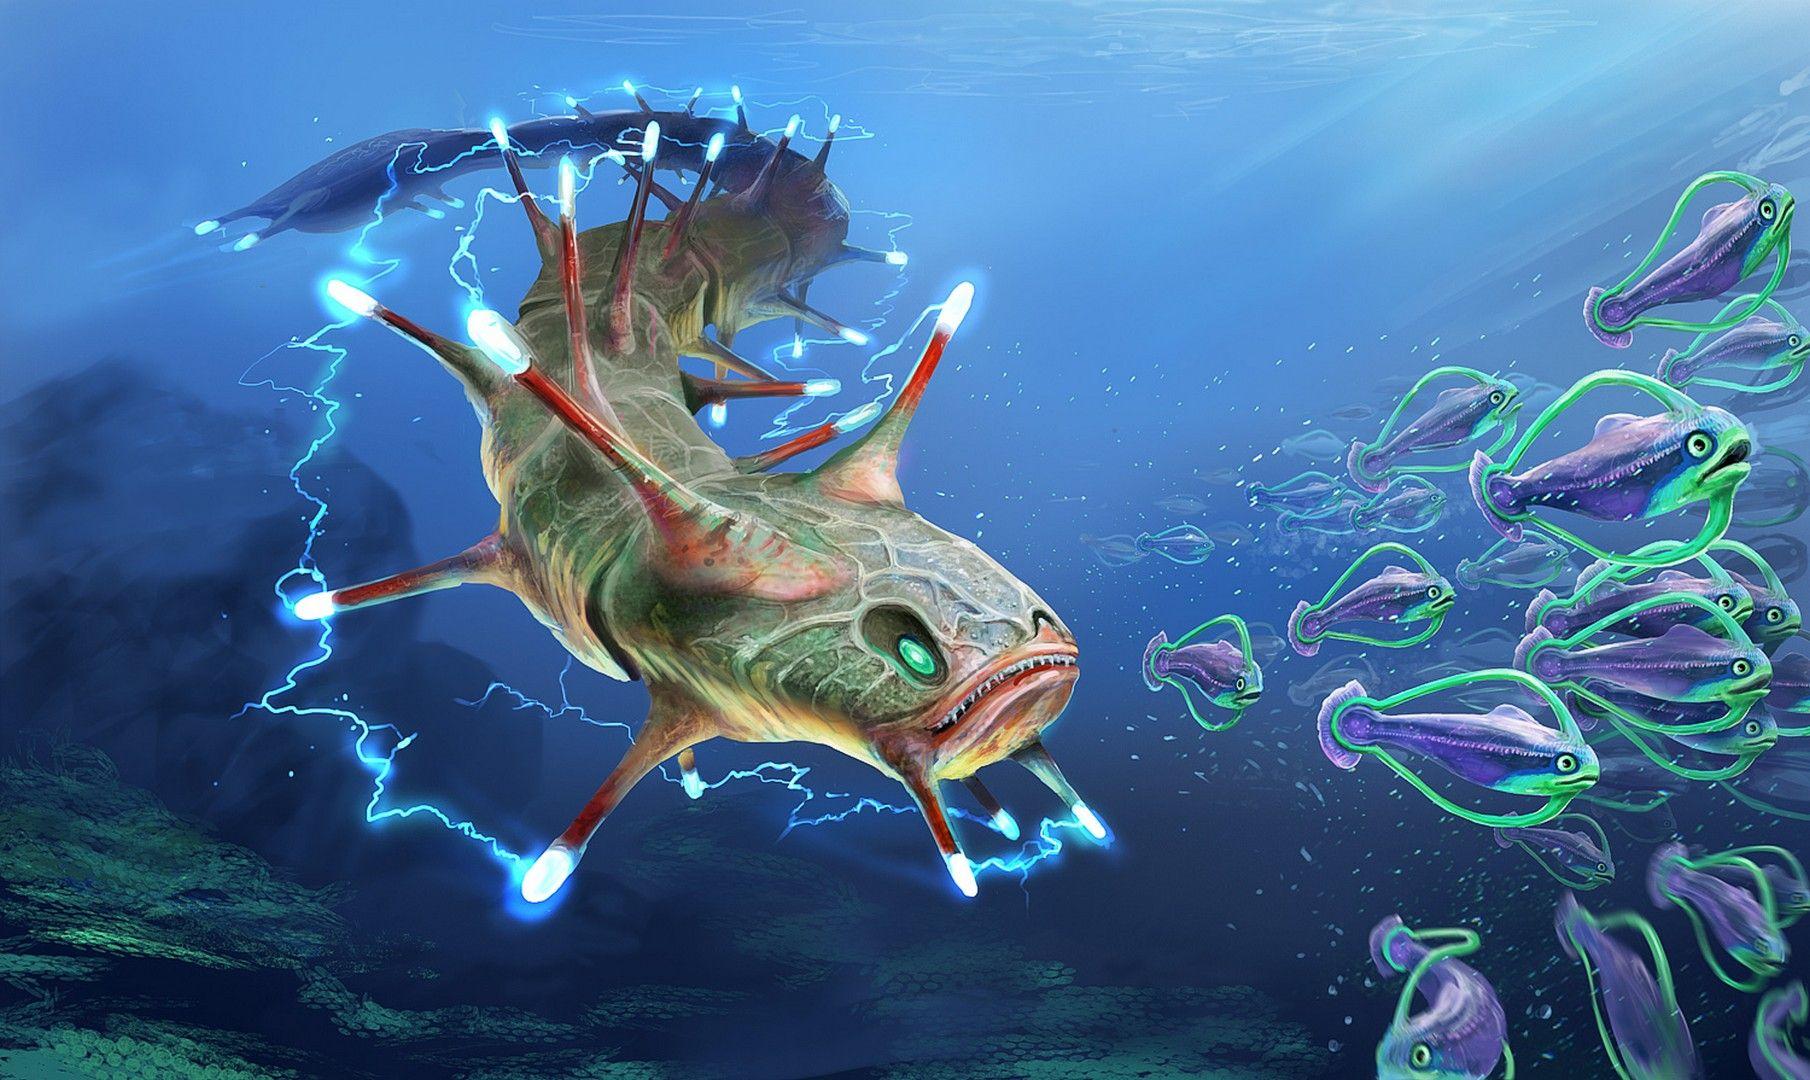 Hd Electric Eel Wallpaper Subnautica Creatures Subnautica Concept Art Fantasy Creatures